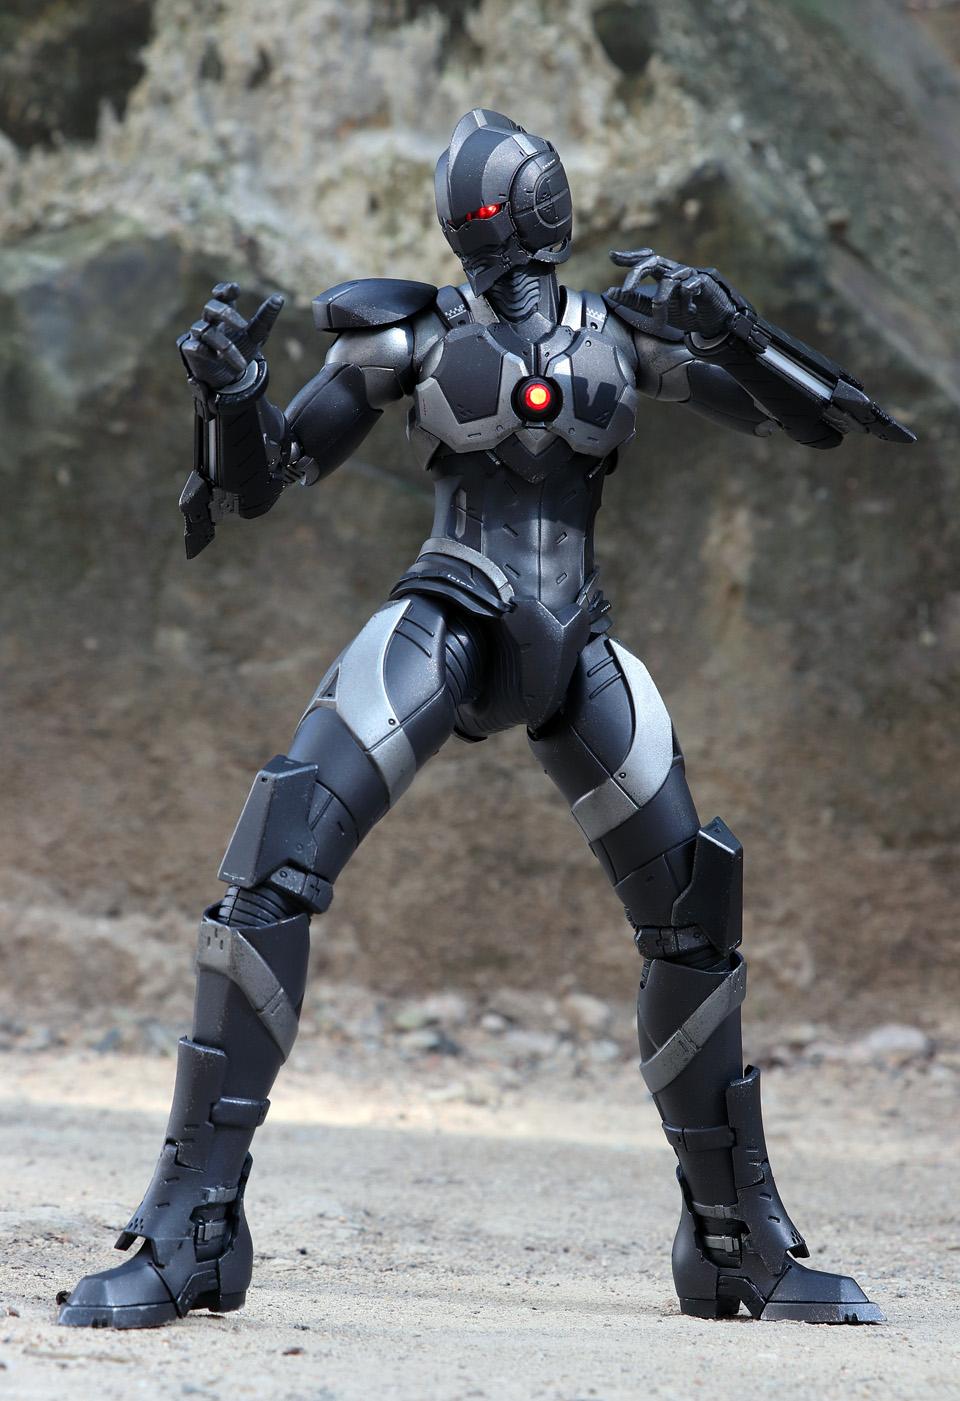 Ultraman Suit 1/6 (3A (ThreeA) Toys/threezero) 23175611